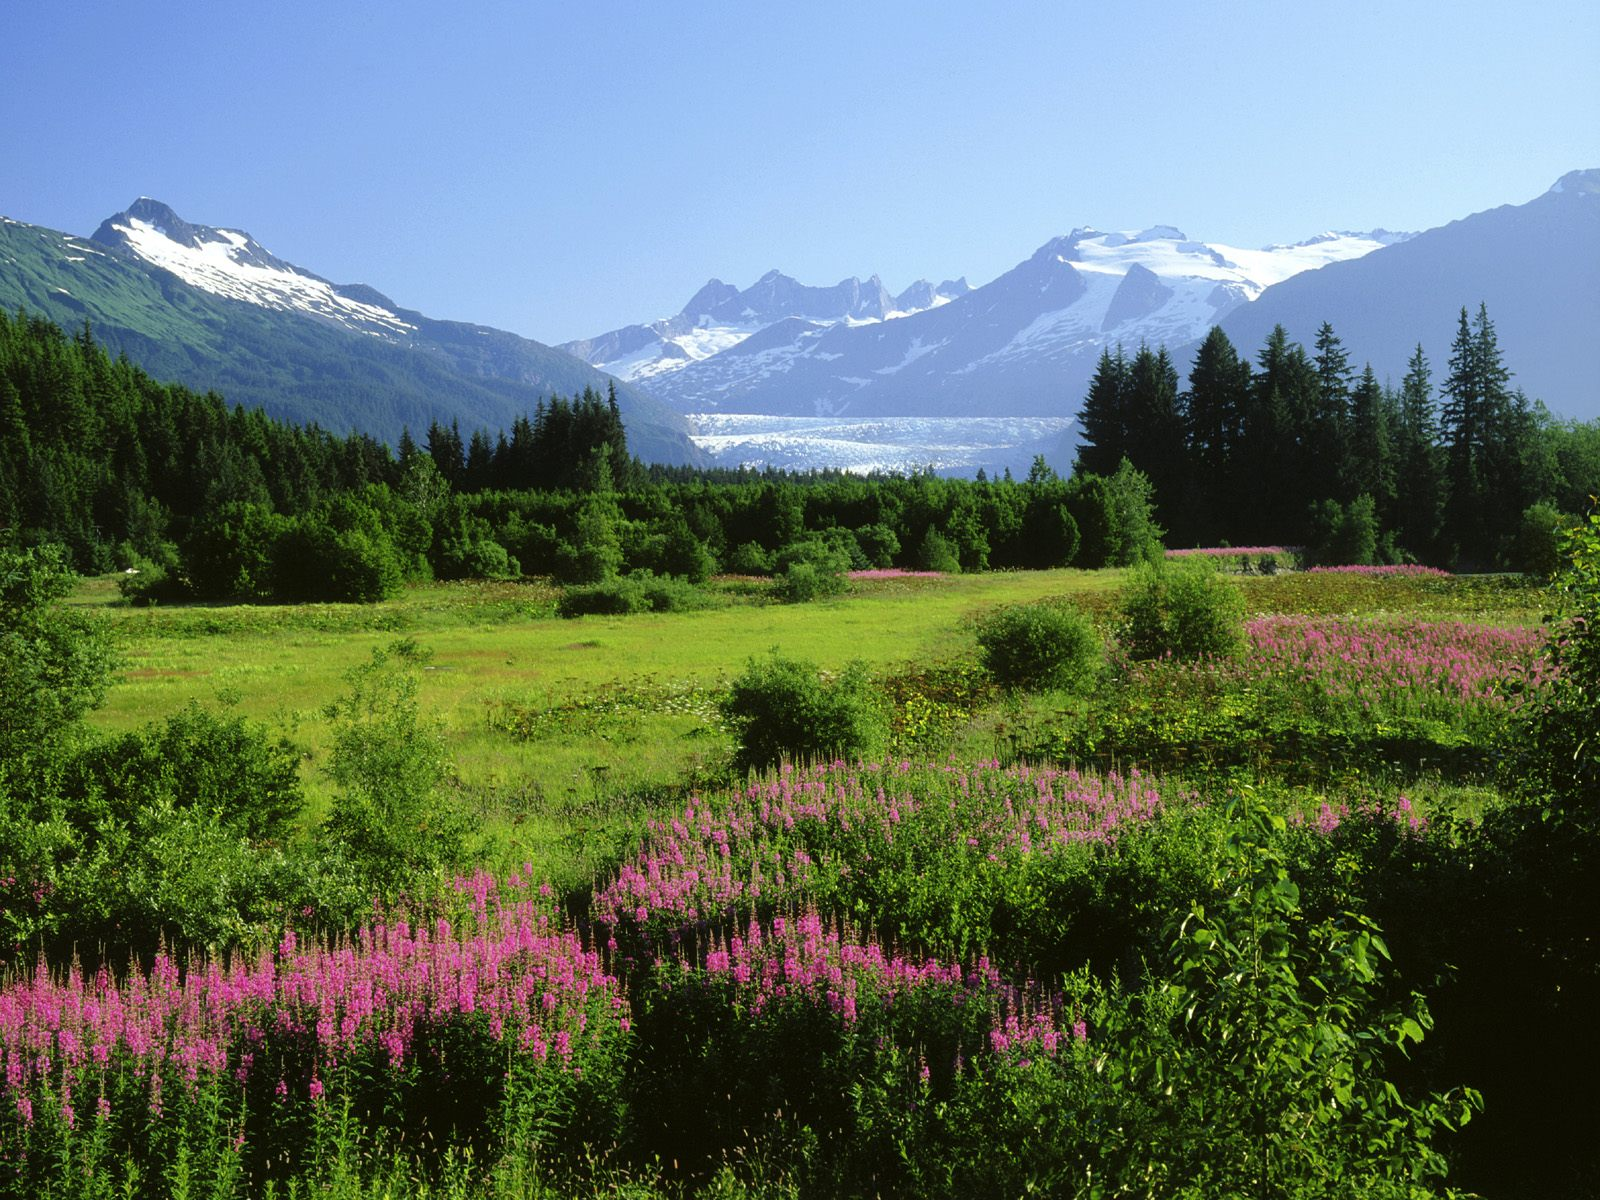 ELENKER High Resolution Binocular 30 x 60 for Travel Alaska high resolution pictures